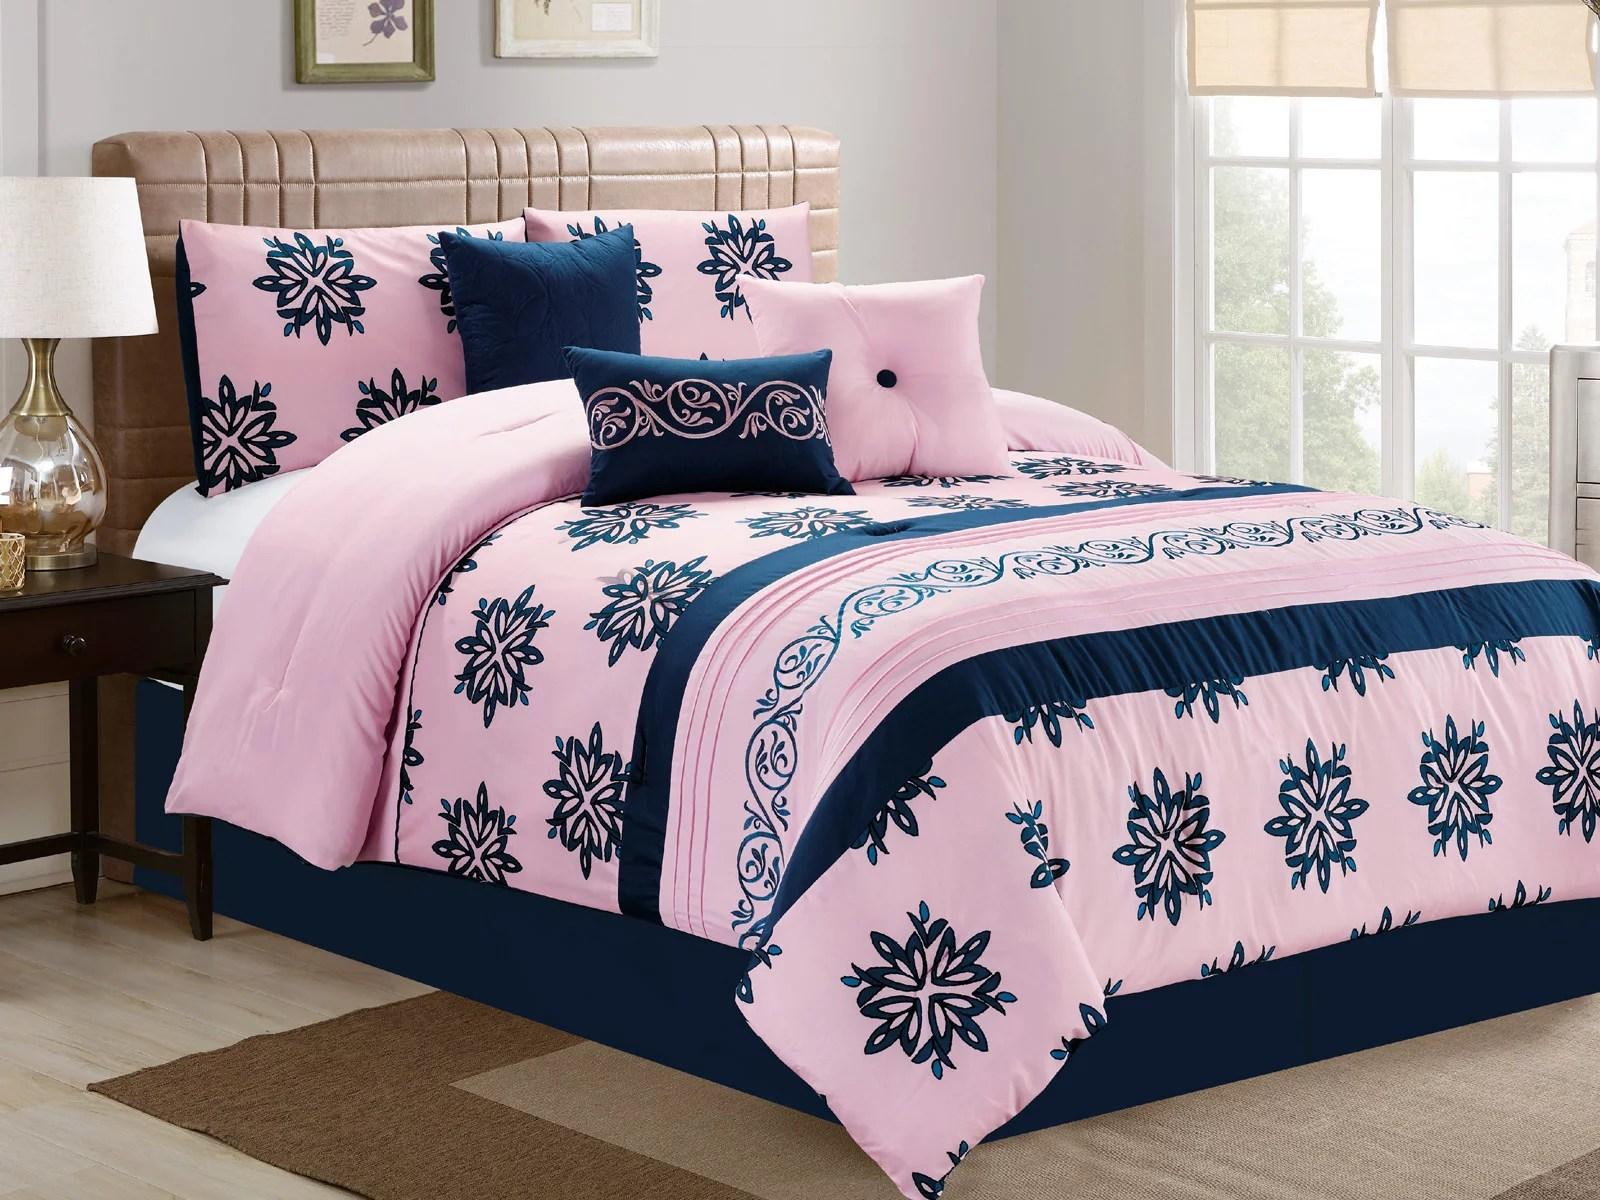 7 pc prisca floral leaves scroll vine damask embroidery comforter set blush pink navy blue king